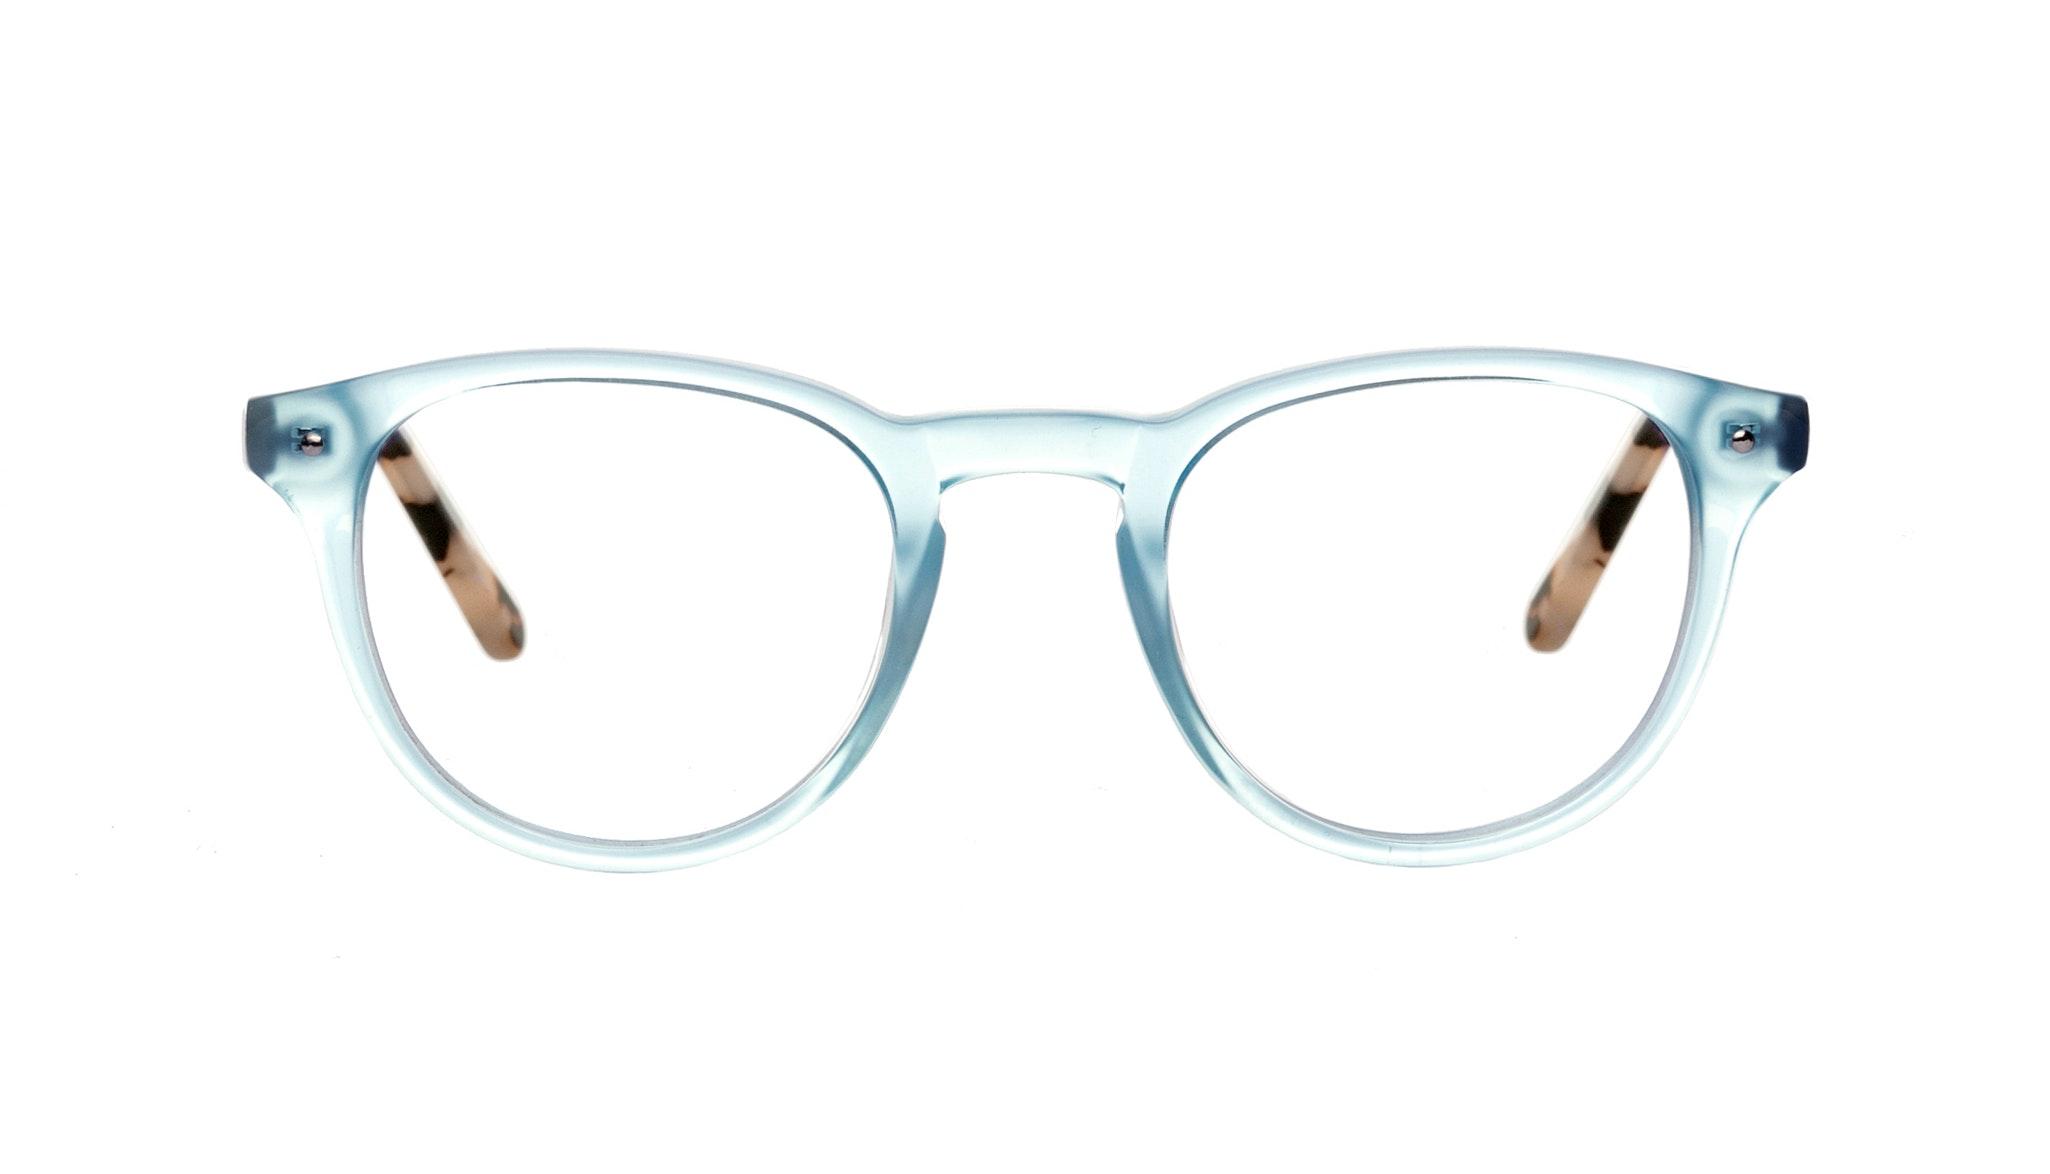 Affordable Fashion Glasses Round Eyeglasses Men Women Cult Blue Granite